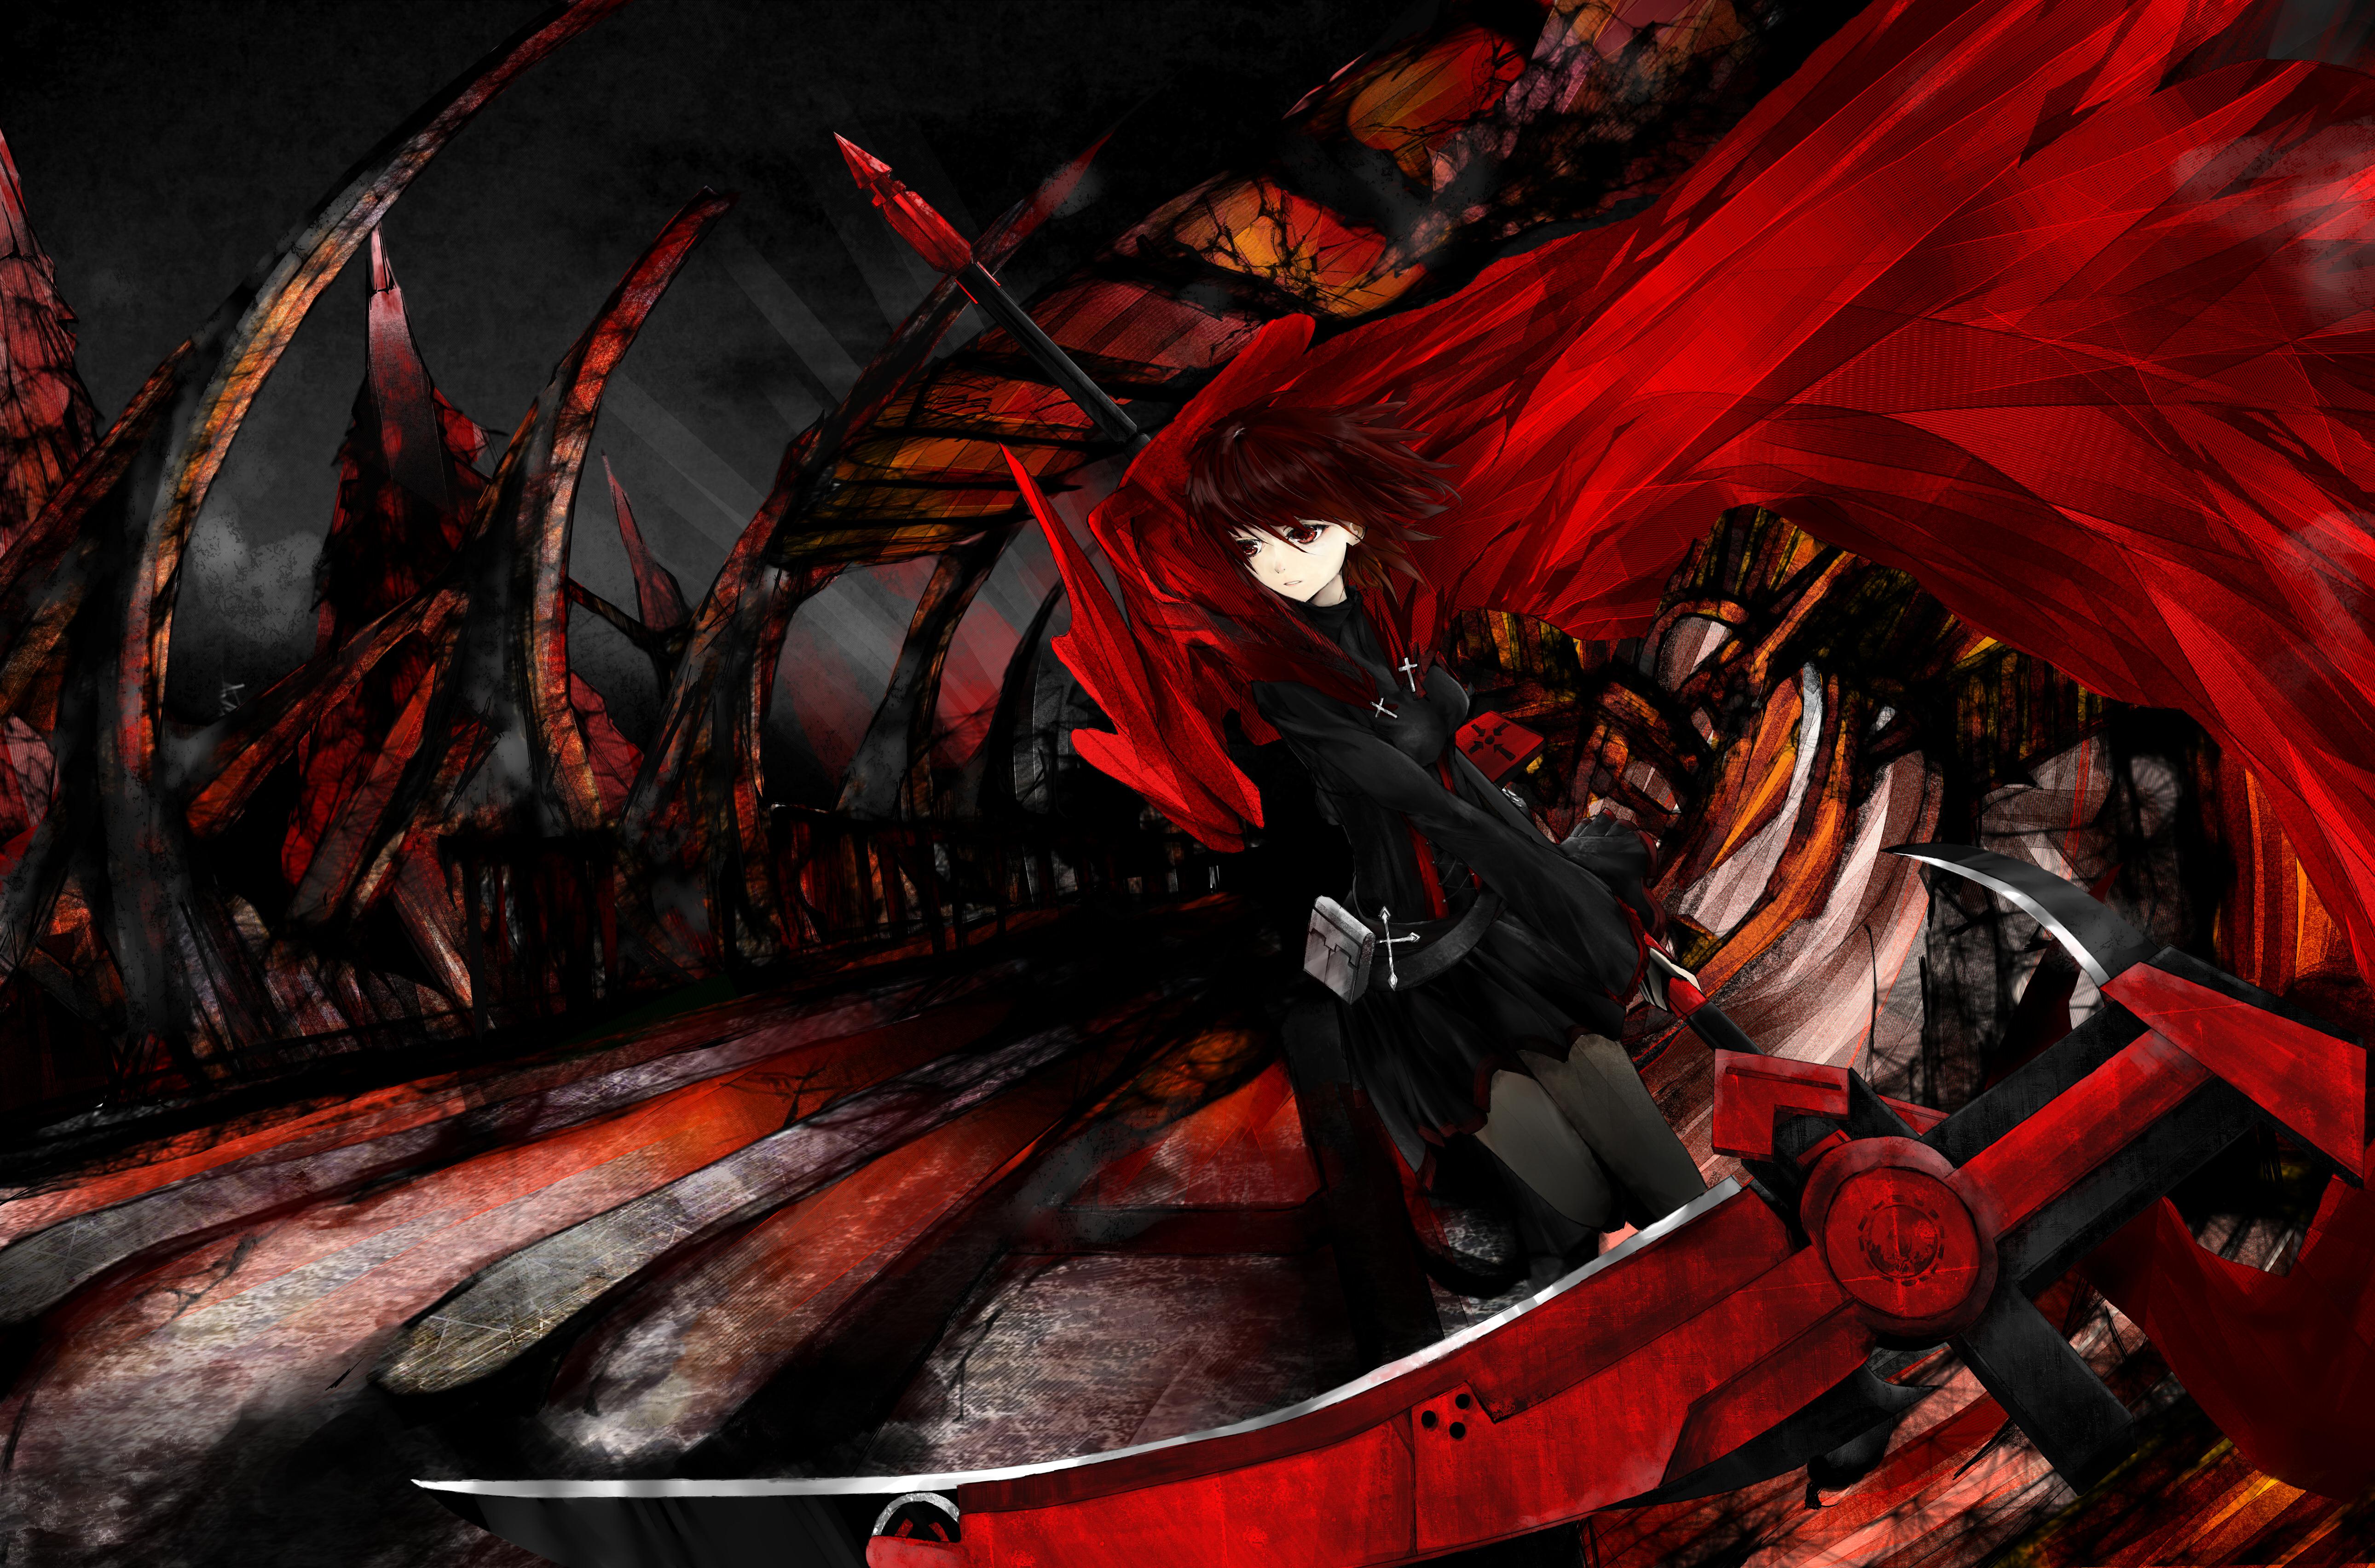 Drawn scythe red (rwby) by drawn rose Information